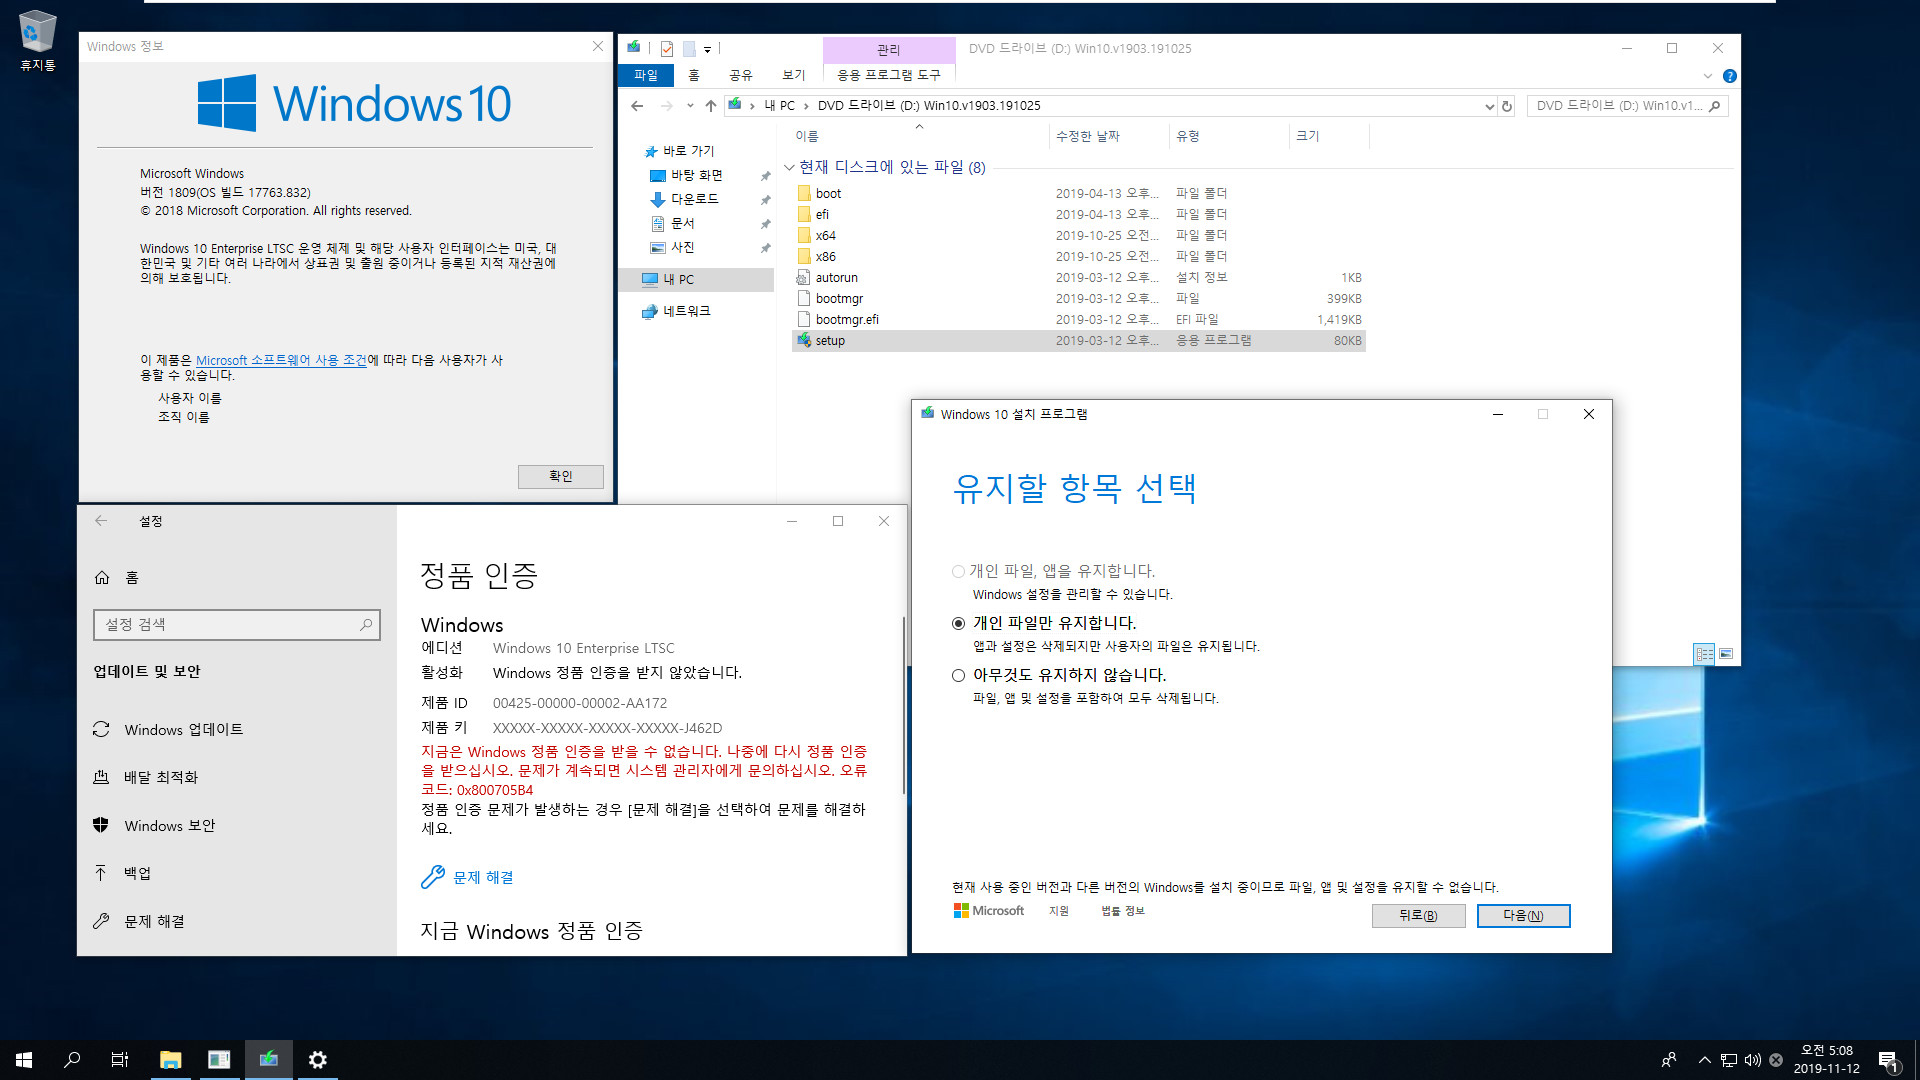 Windows 10 Enterprise LTSC [2019] (버전 1809) 를 버전 1903 프로로 업그레이드 설치하기 - 우선 설정과 앱 유지를 위해서 버전 1903 Enterprise로 업그레이드 한 후에 버전 1903 Pro로 변경하면 됩니다 2019-11-12_050805.jpg